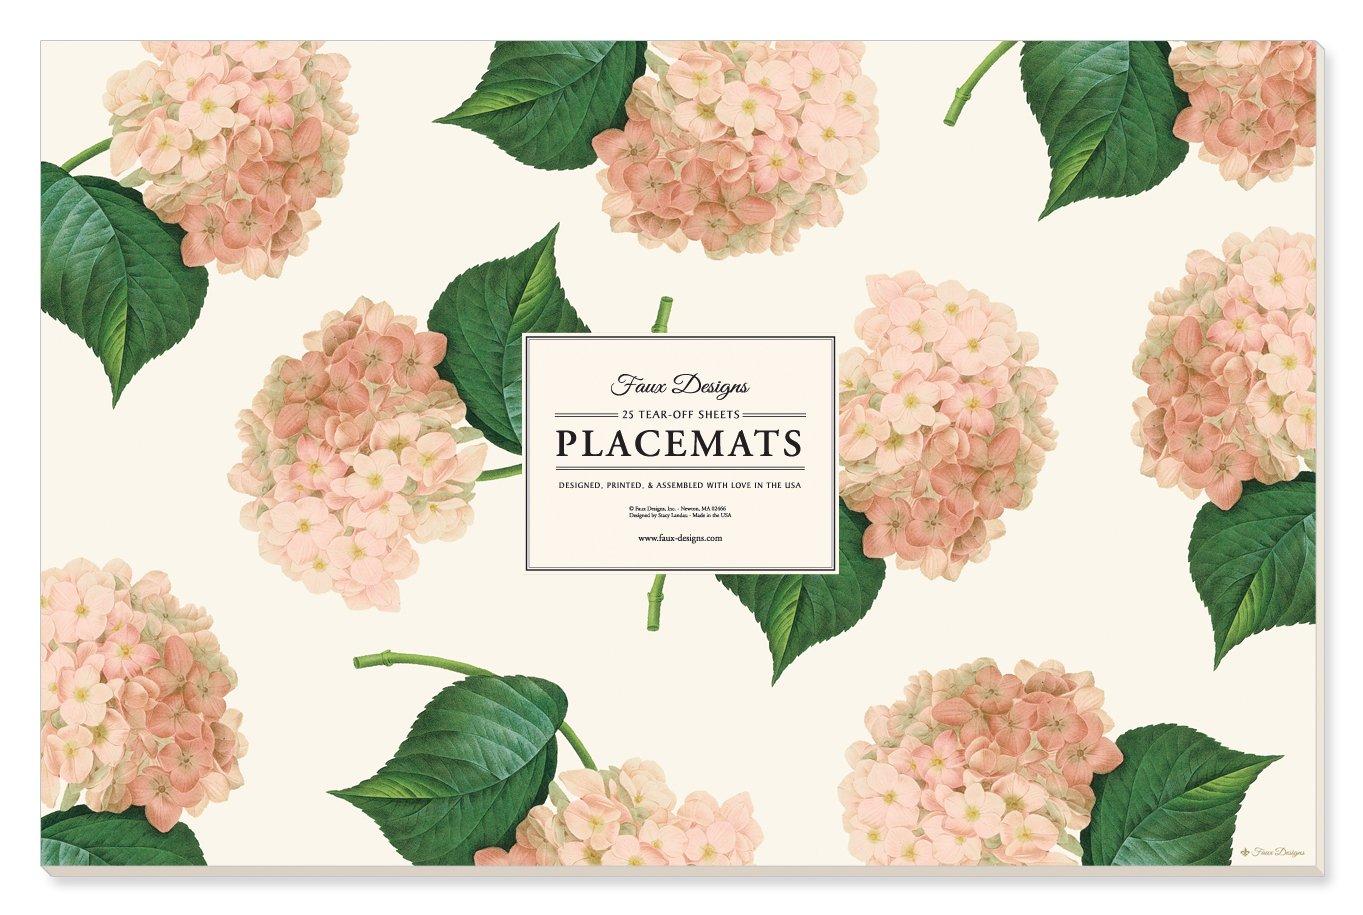 Faux Designs Paper Placemats - Pink Hydrangea